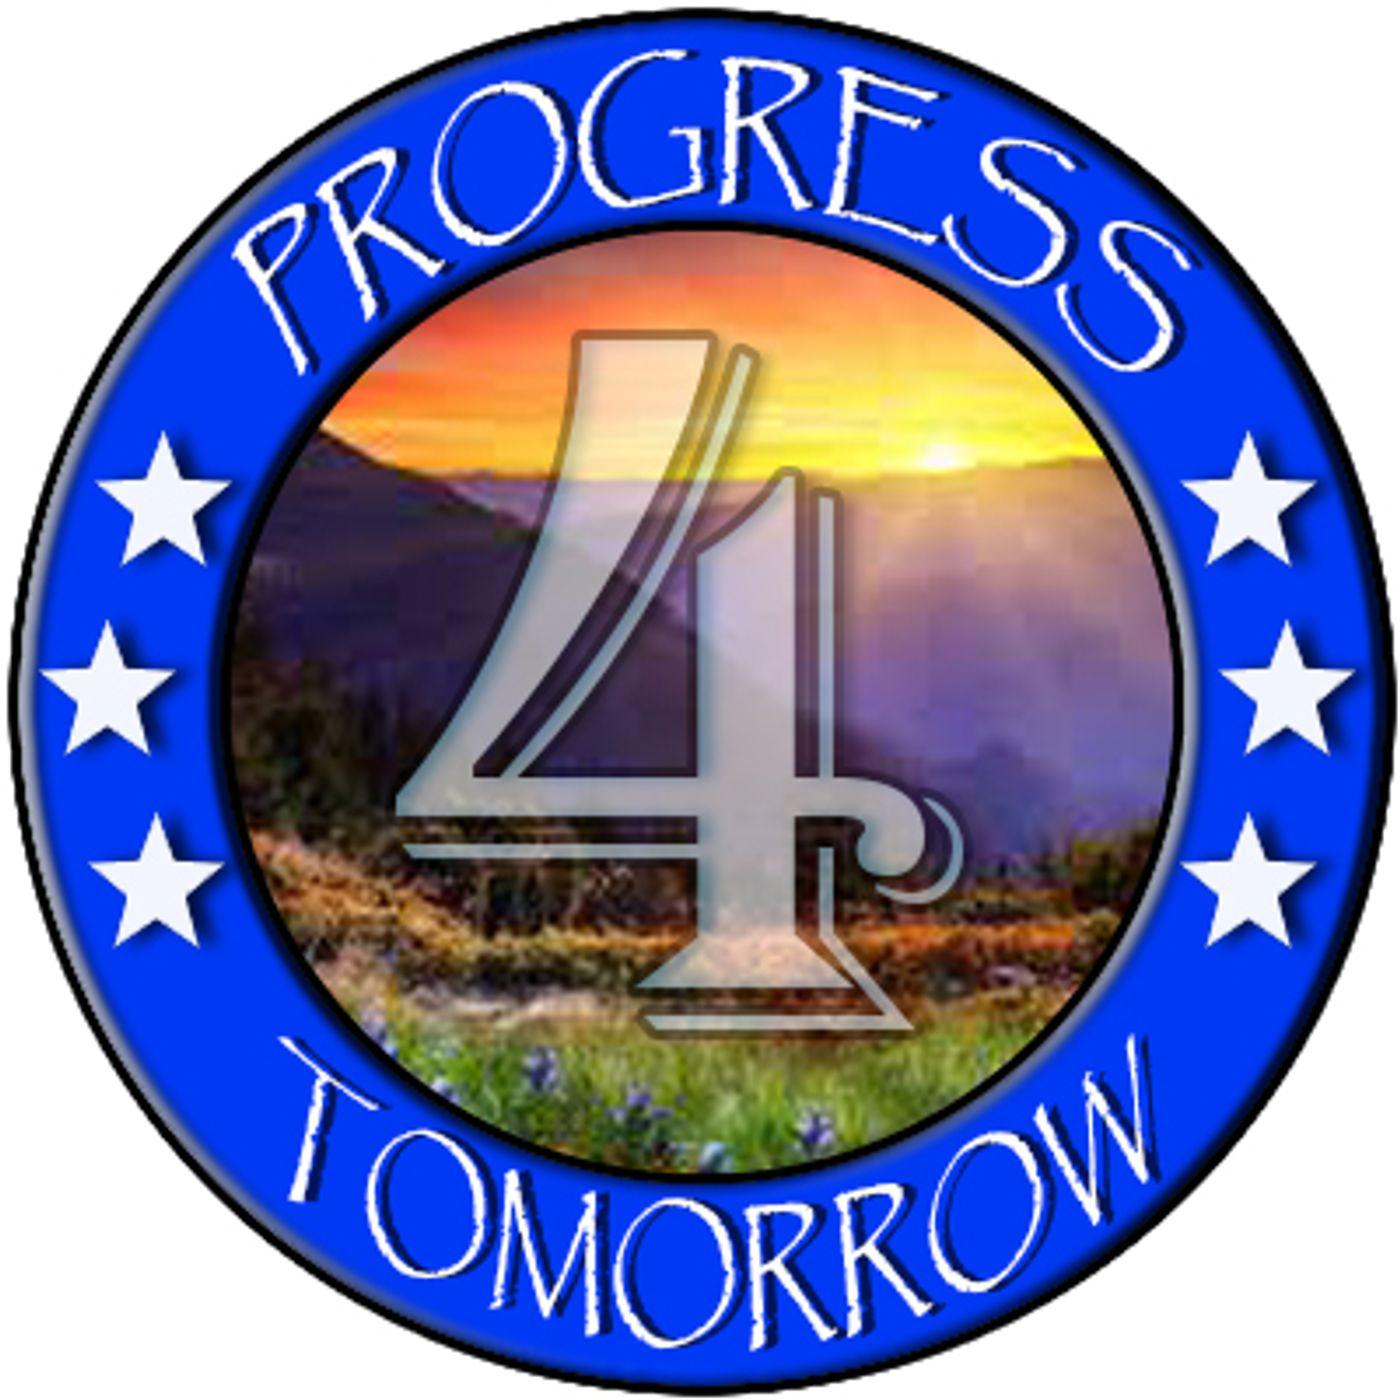 Progress 4 Tomorrow